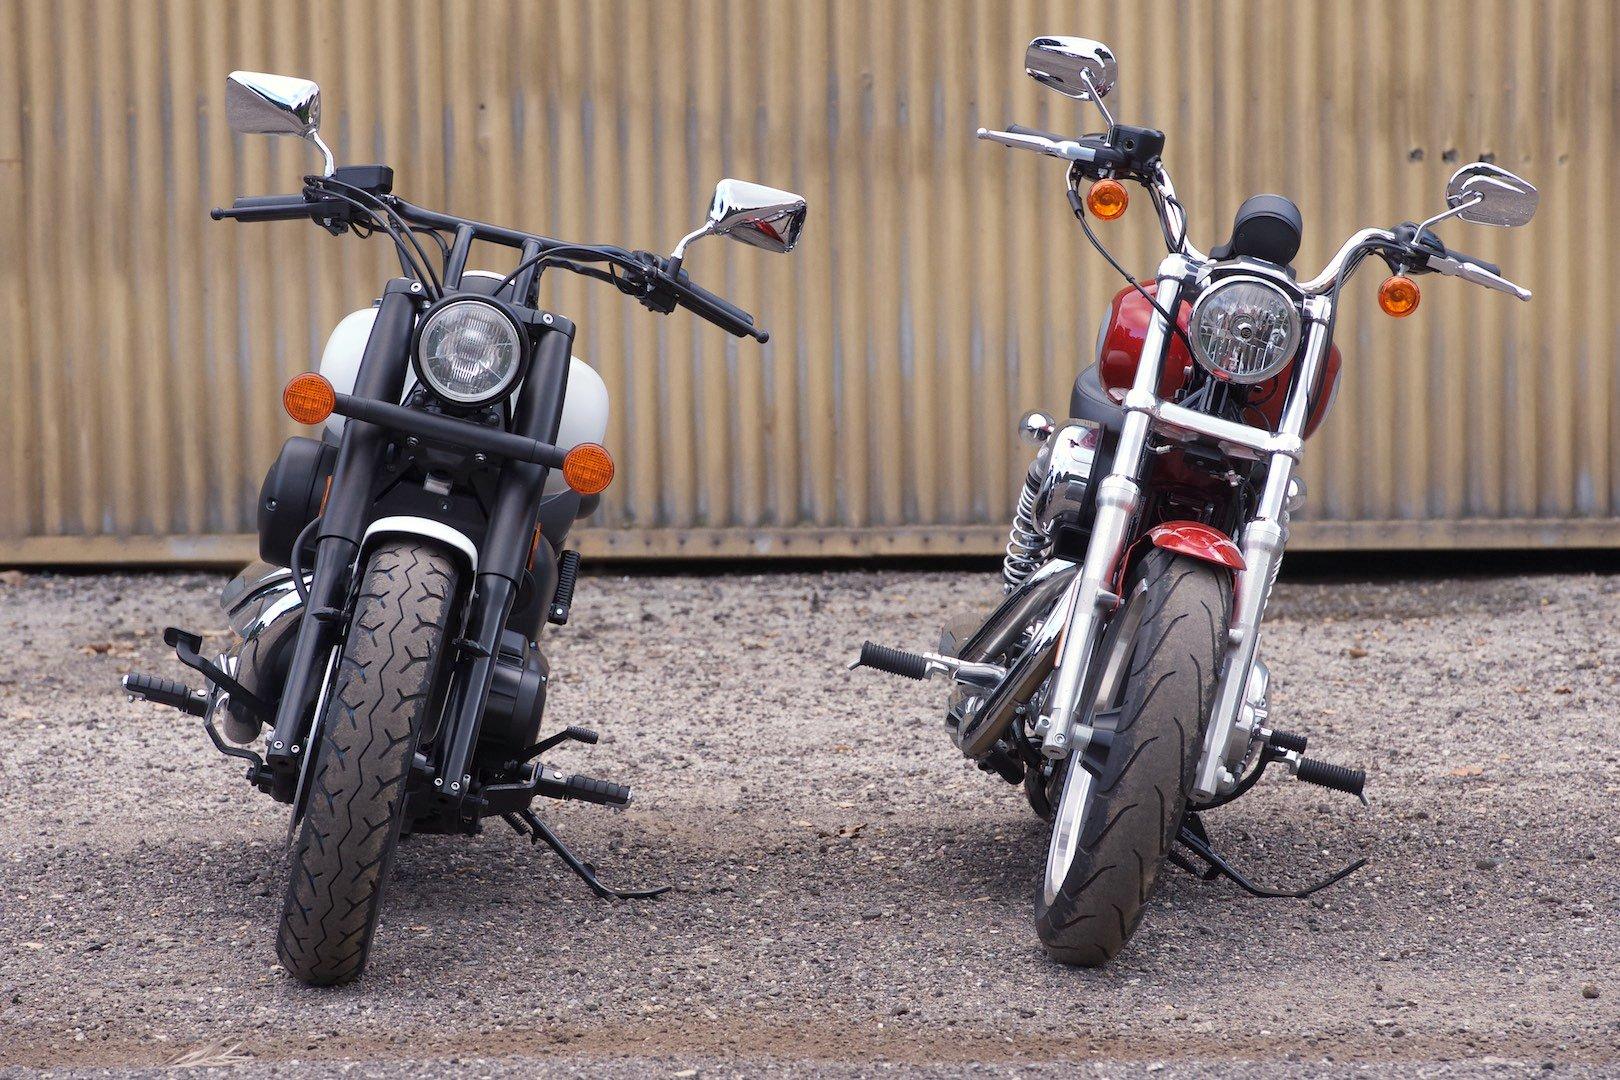 Honda Shadow vs Harley Sportster Superlow